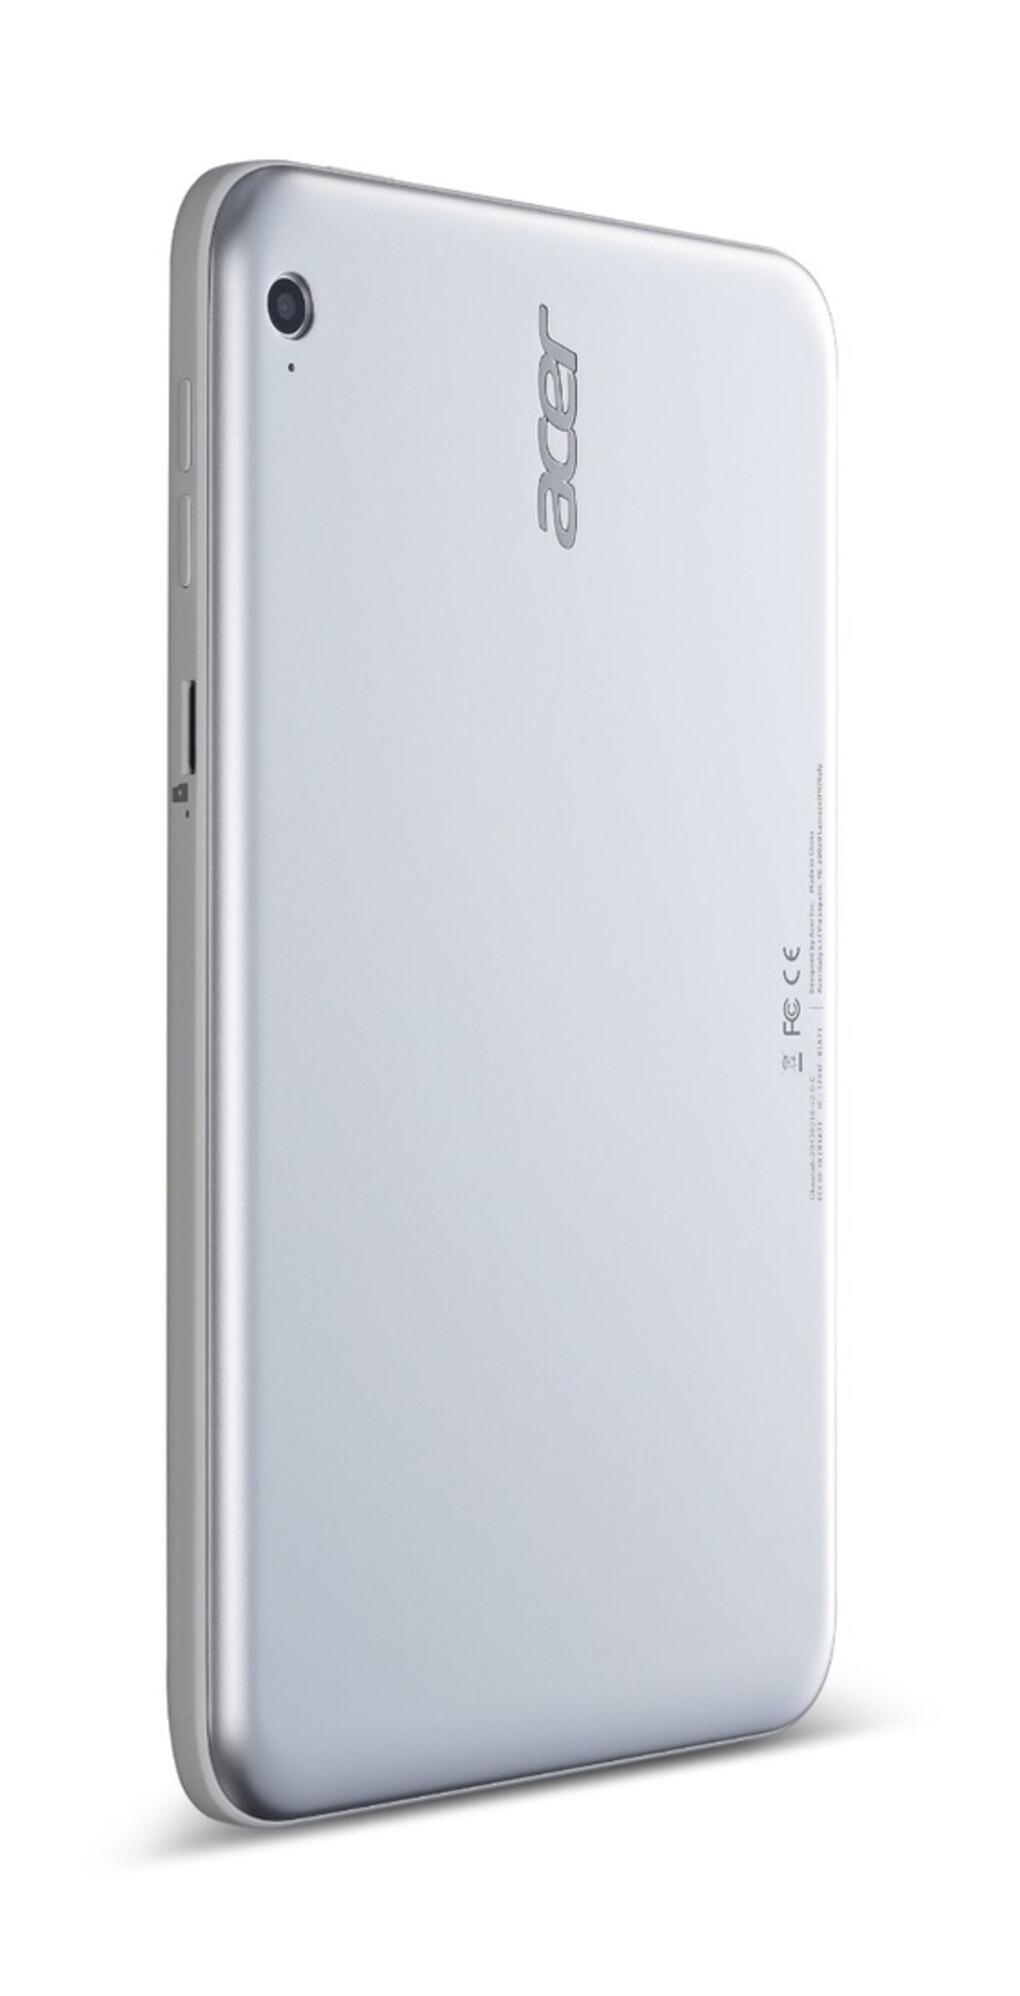 W3-810